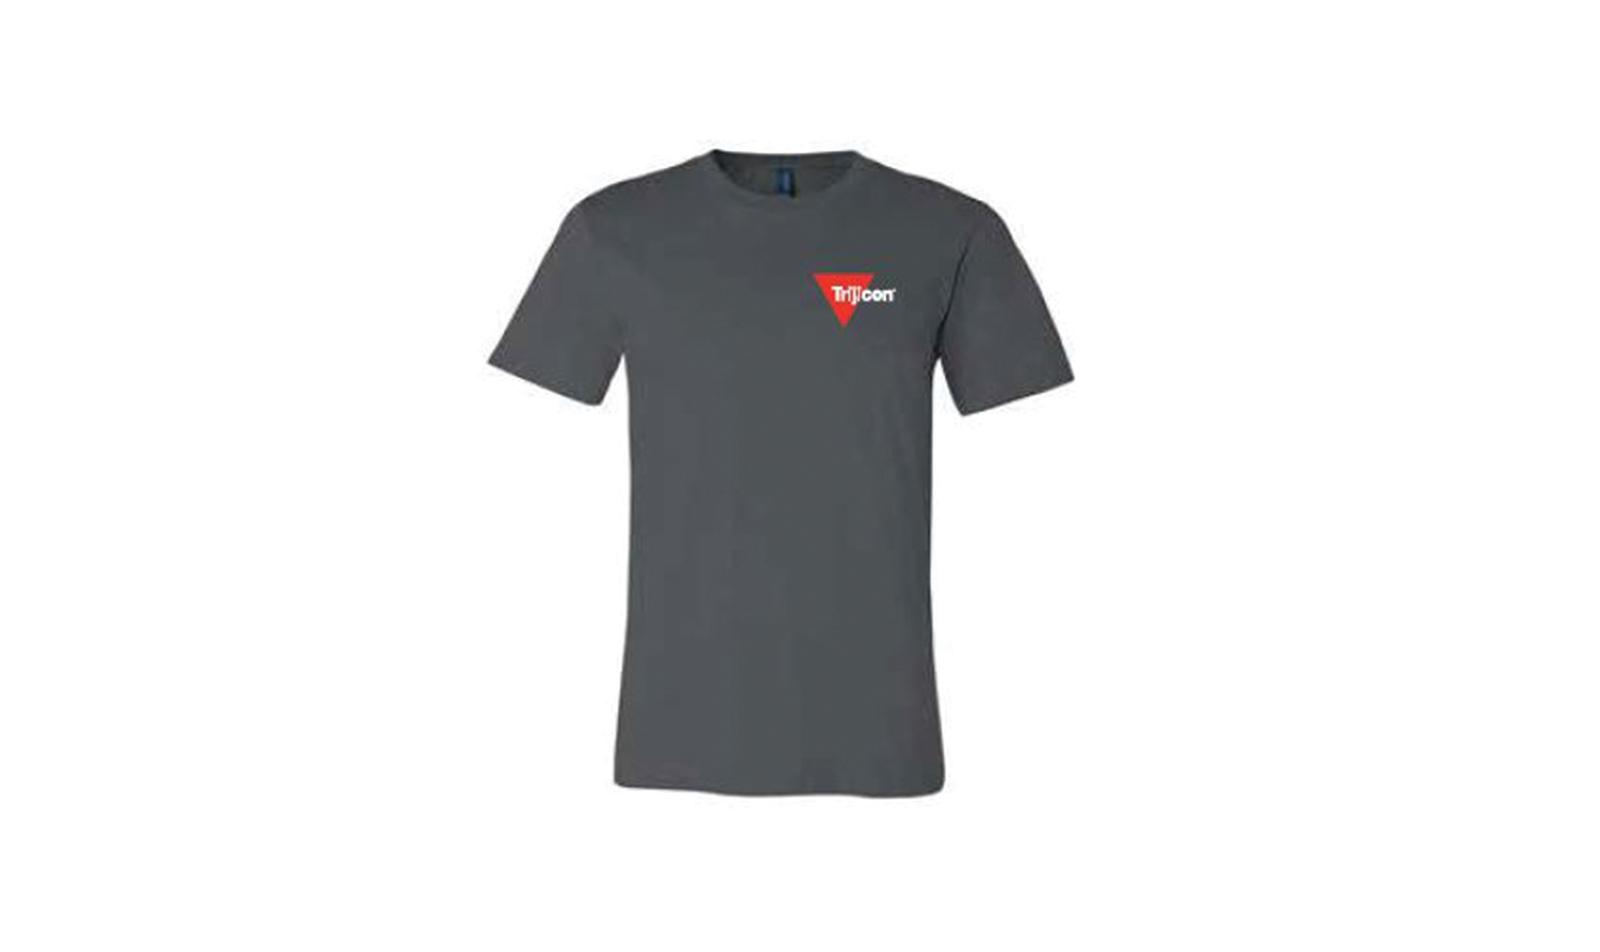 Trijicon<sup>®</sup> Jersey T-Shirt - Gray - 2X